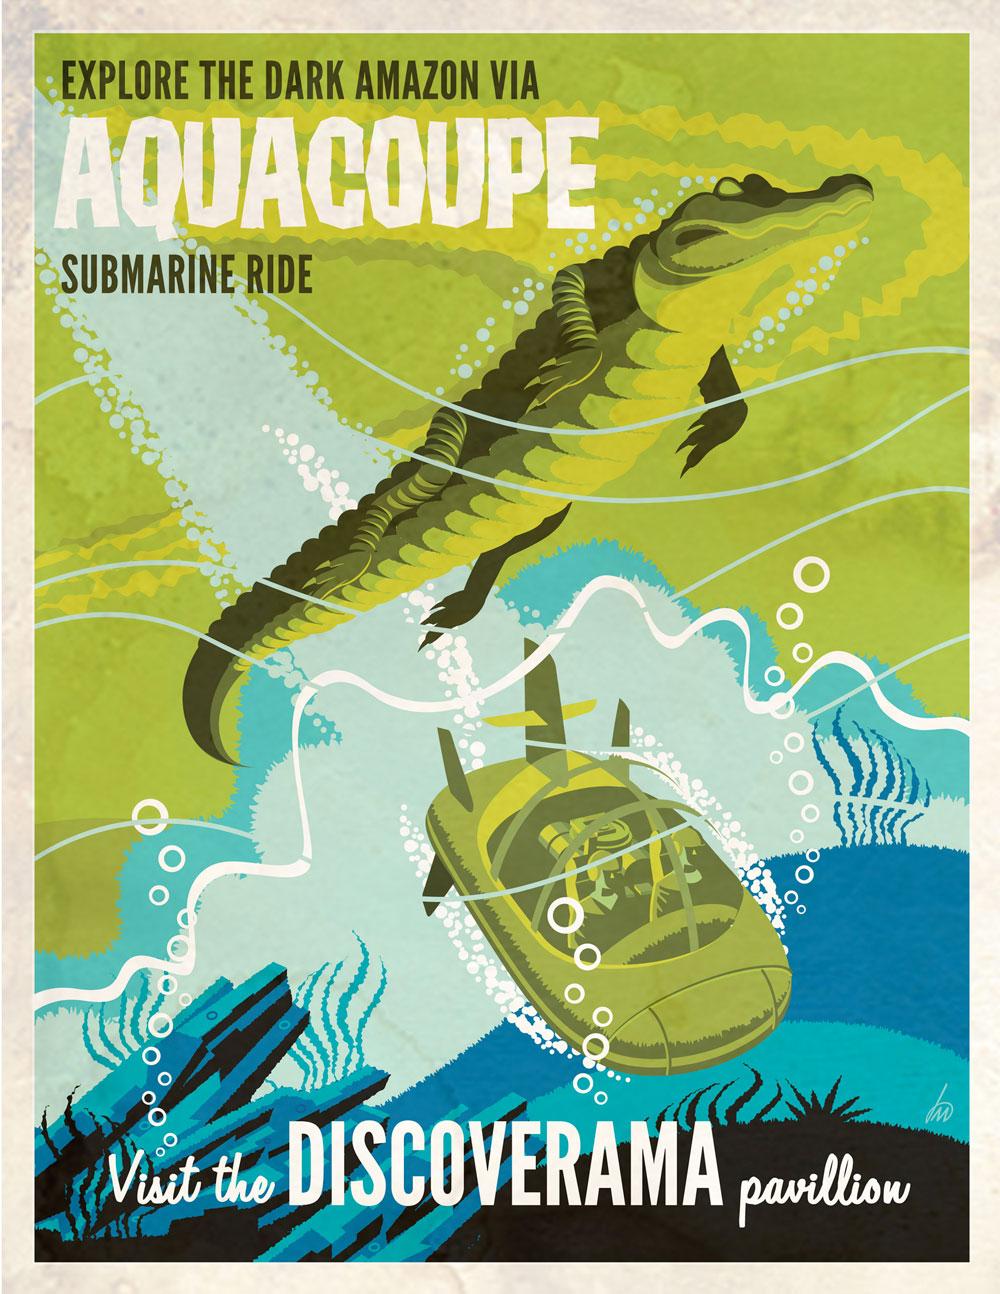 Aquacoupe